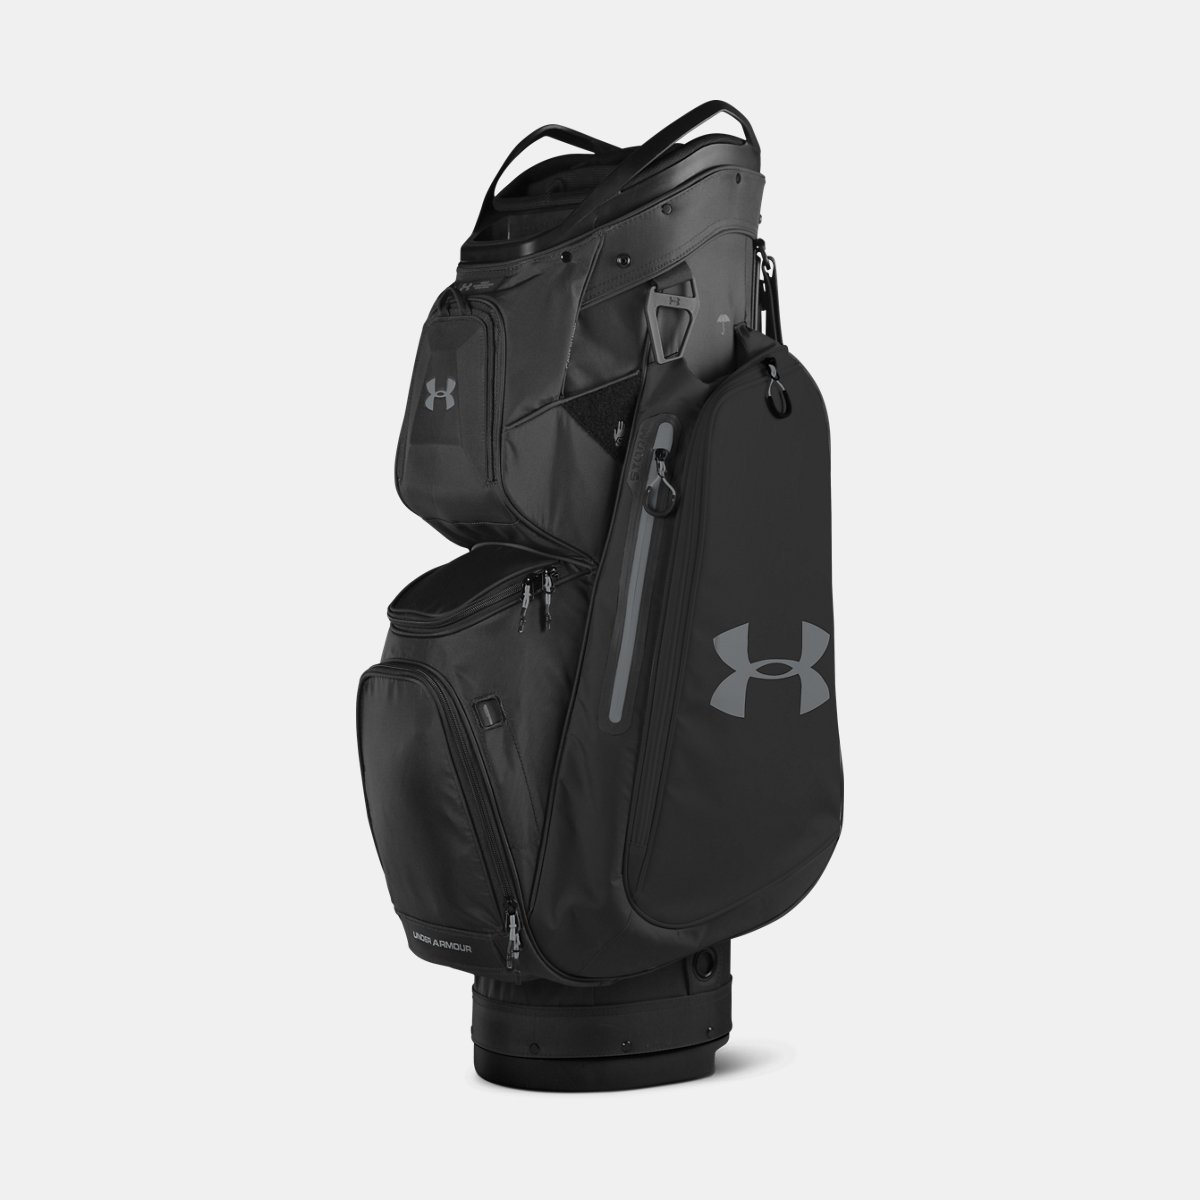 [UNDER ARMOUR] アンダーアーマー Men's UA Storm Armada Cart Bag Black [並行輸入品]   B074Z52348